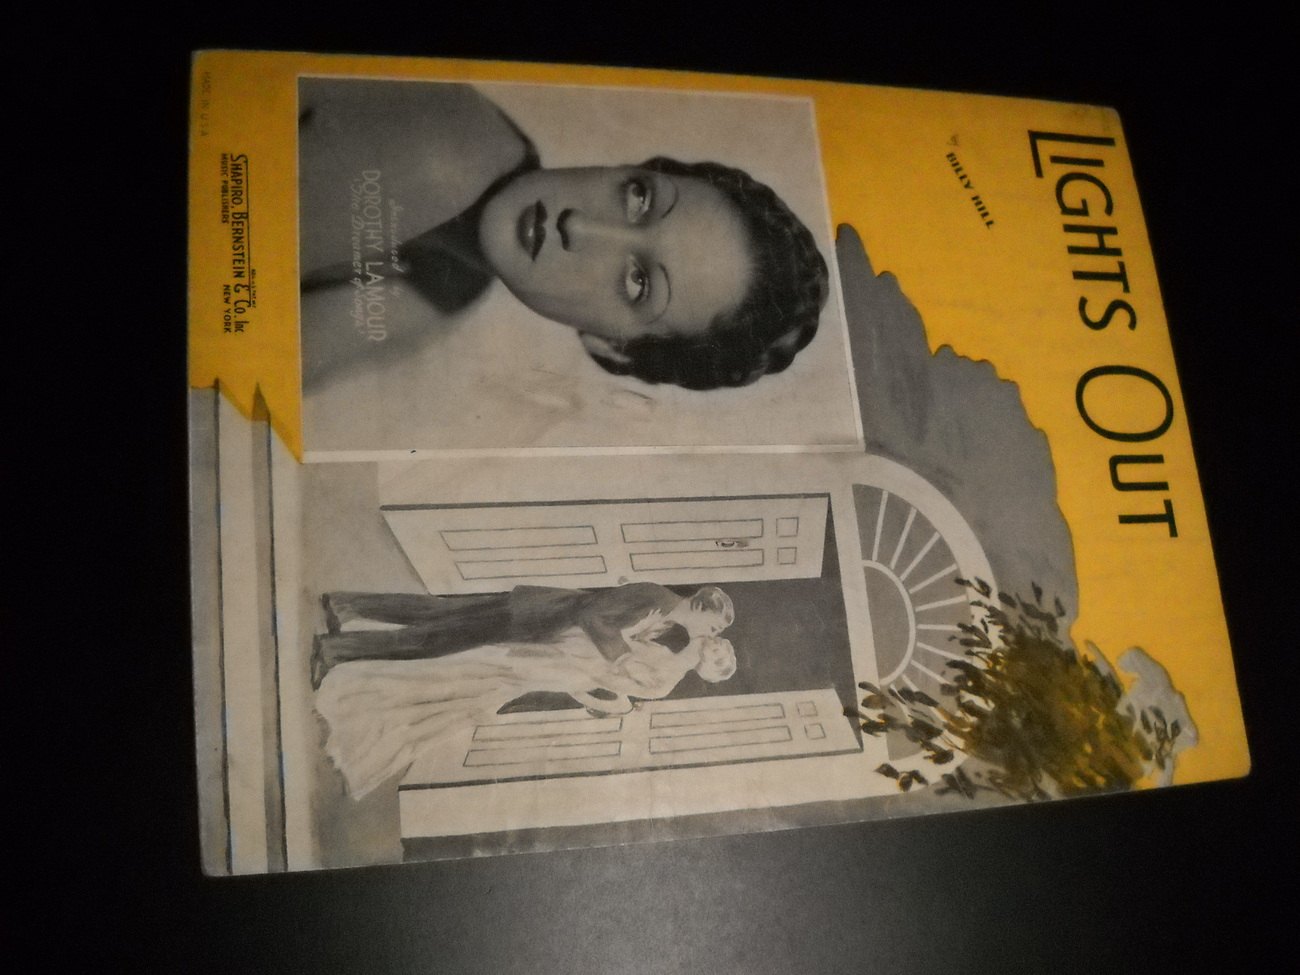 Sheet_music_lights_out_dorothy_lamour_billy_hill_1935_shapiro_bernstein_01